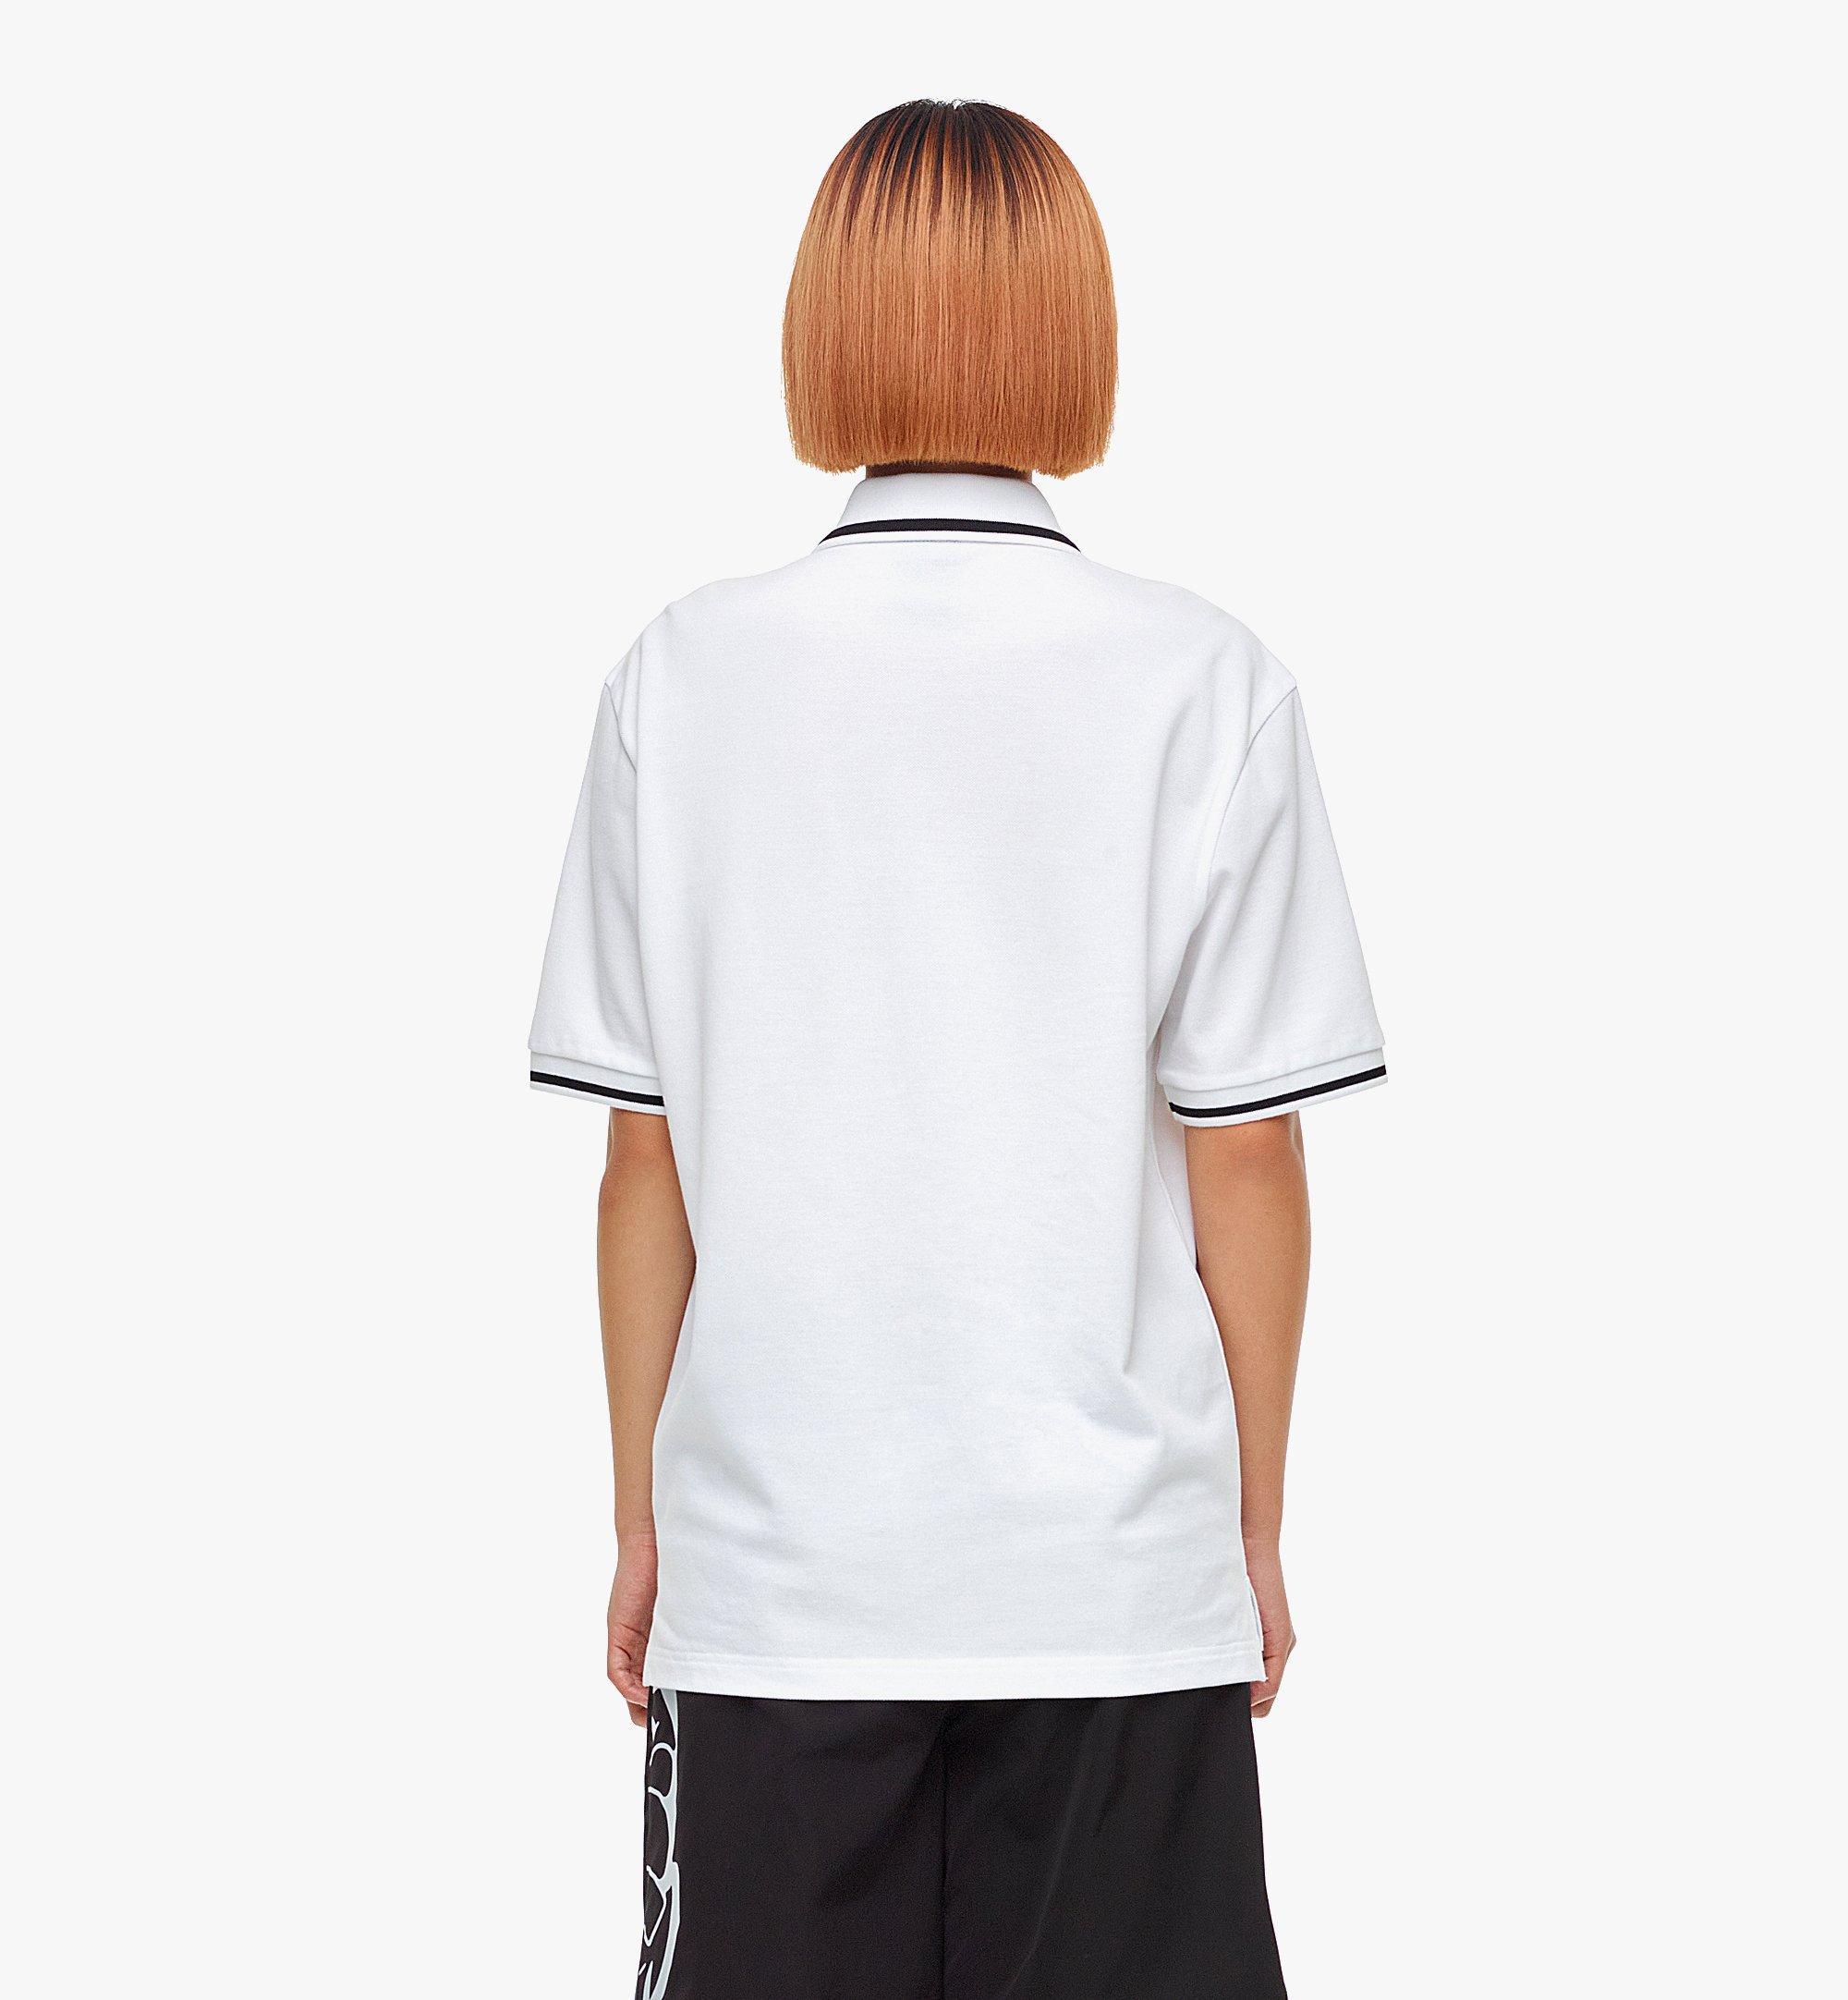 MCM เสื้อโปโล MCM x SAMBYPEN สำหรับผู้ชาย White MHTBASP01WT00L มุมมองอื่น 8